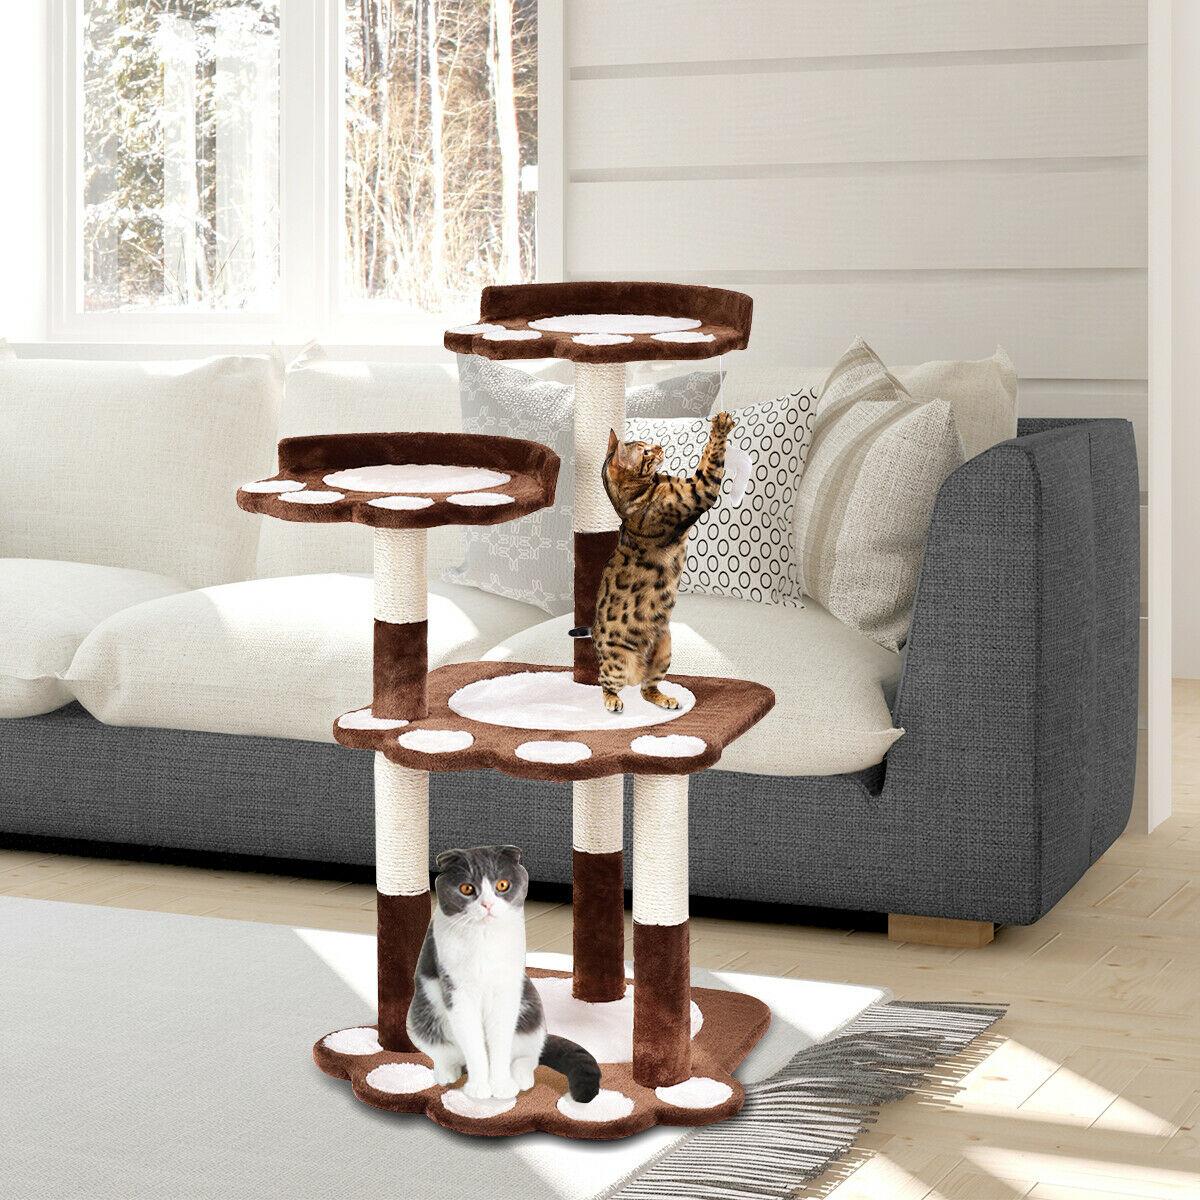 Gymax 42'' Cat Tree Kitten Pet Furniture Multi-level Climb Scratching Posts Paw Brown - image 10 de 10